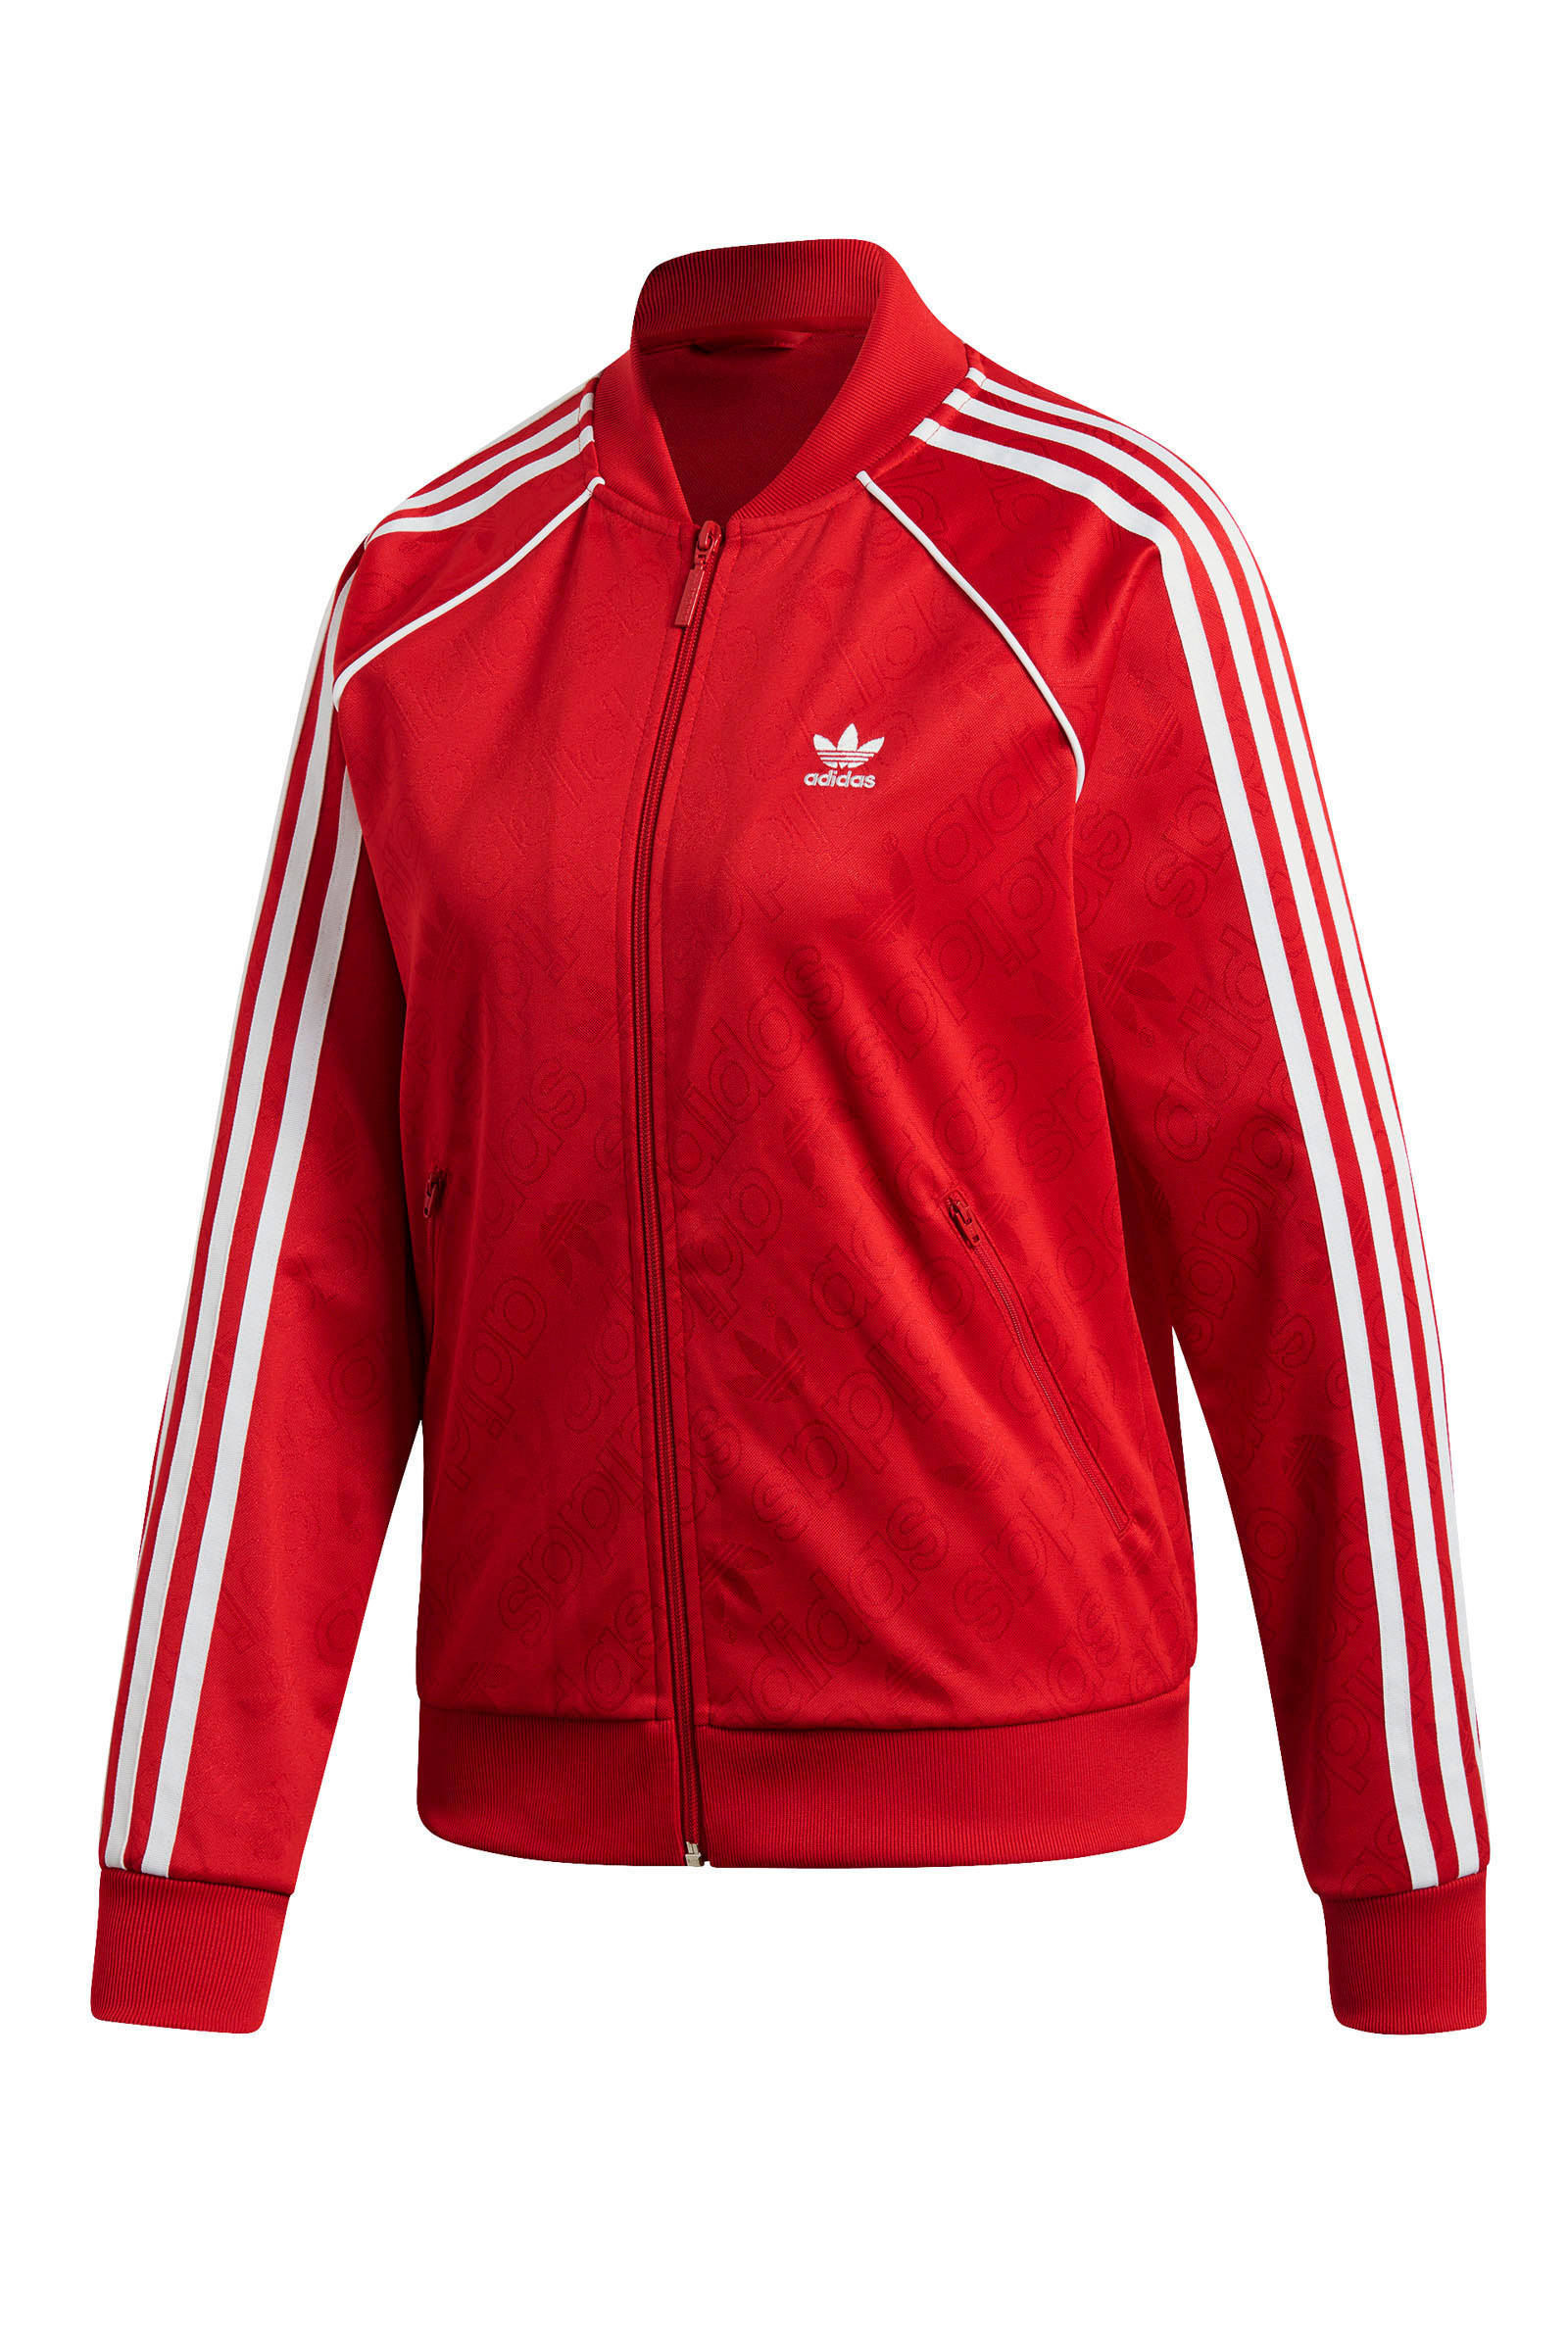 adidas Originals Adicolor vest rood   wehkamp